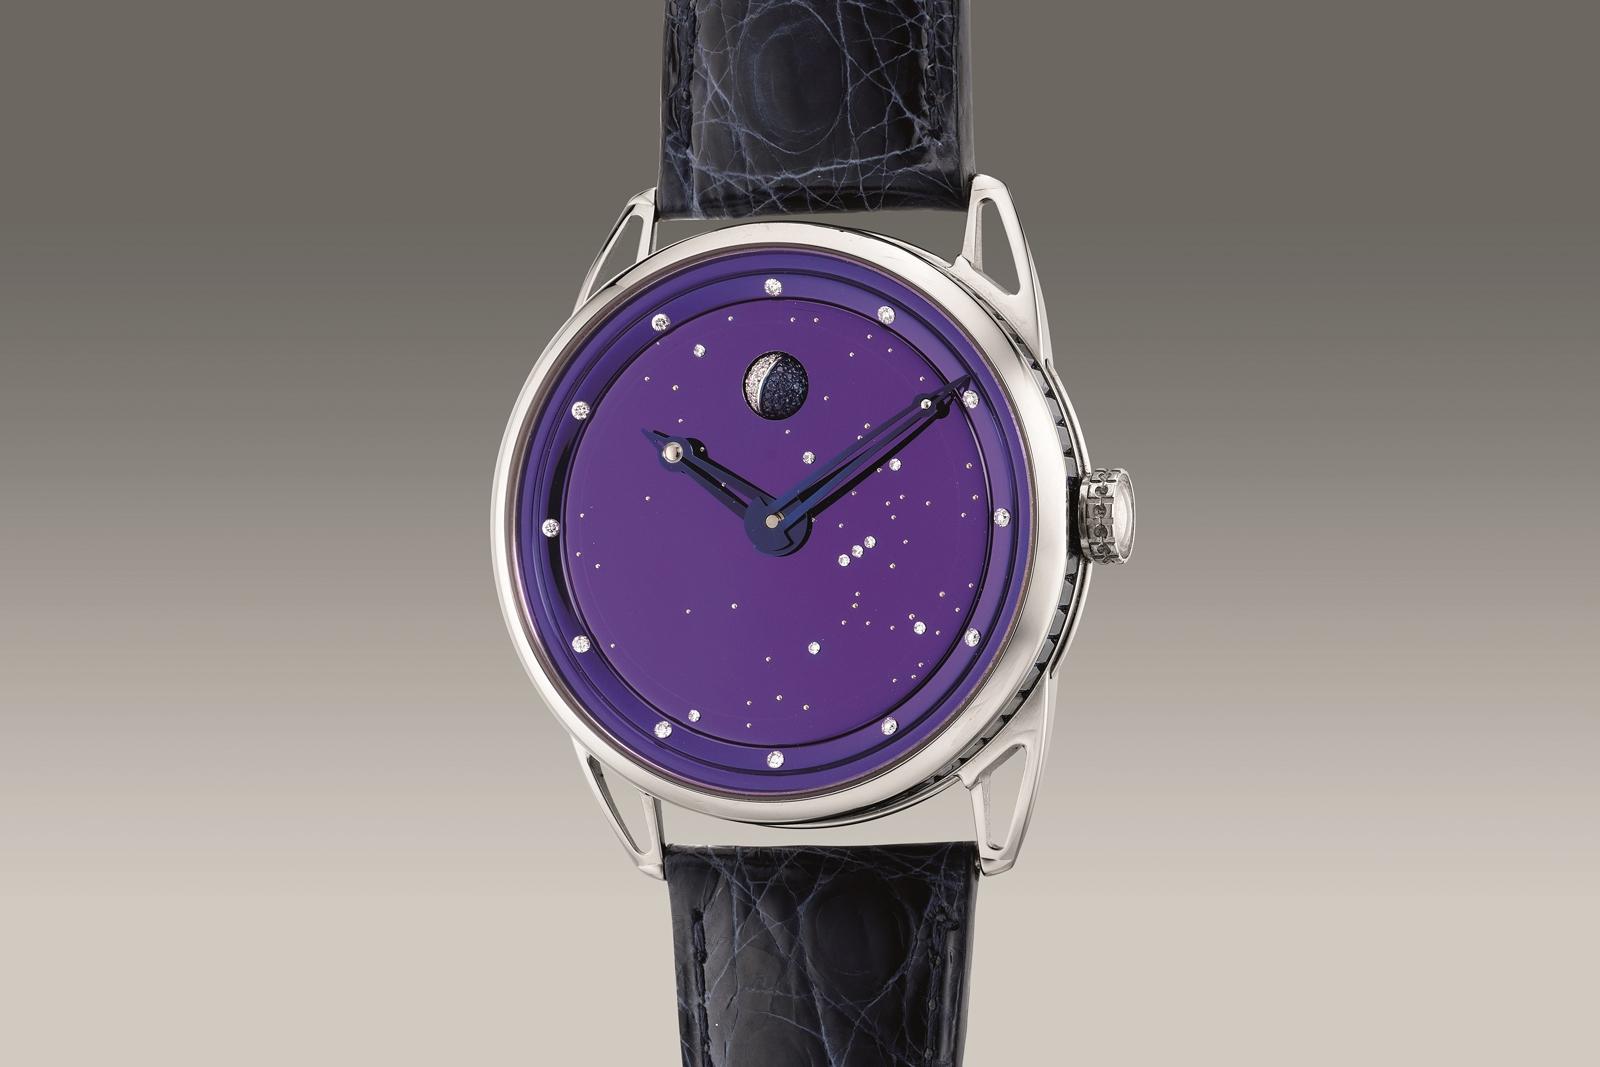 đồng hồ DB25 Moon Phase Starry Sky